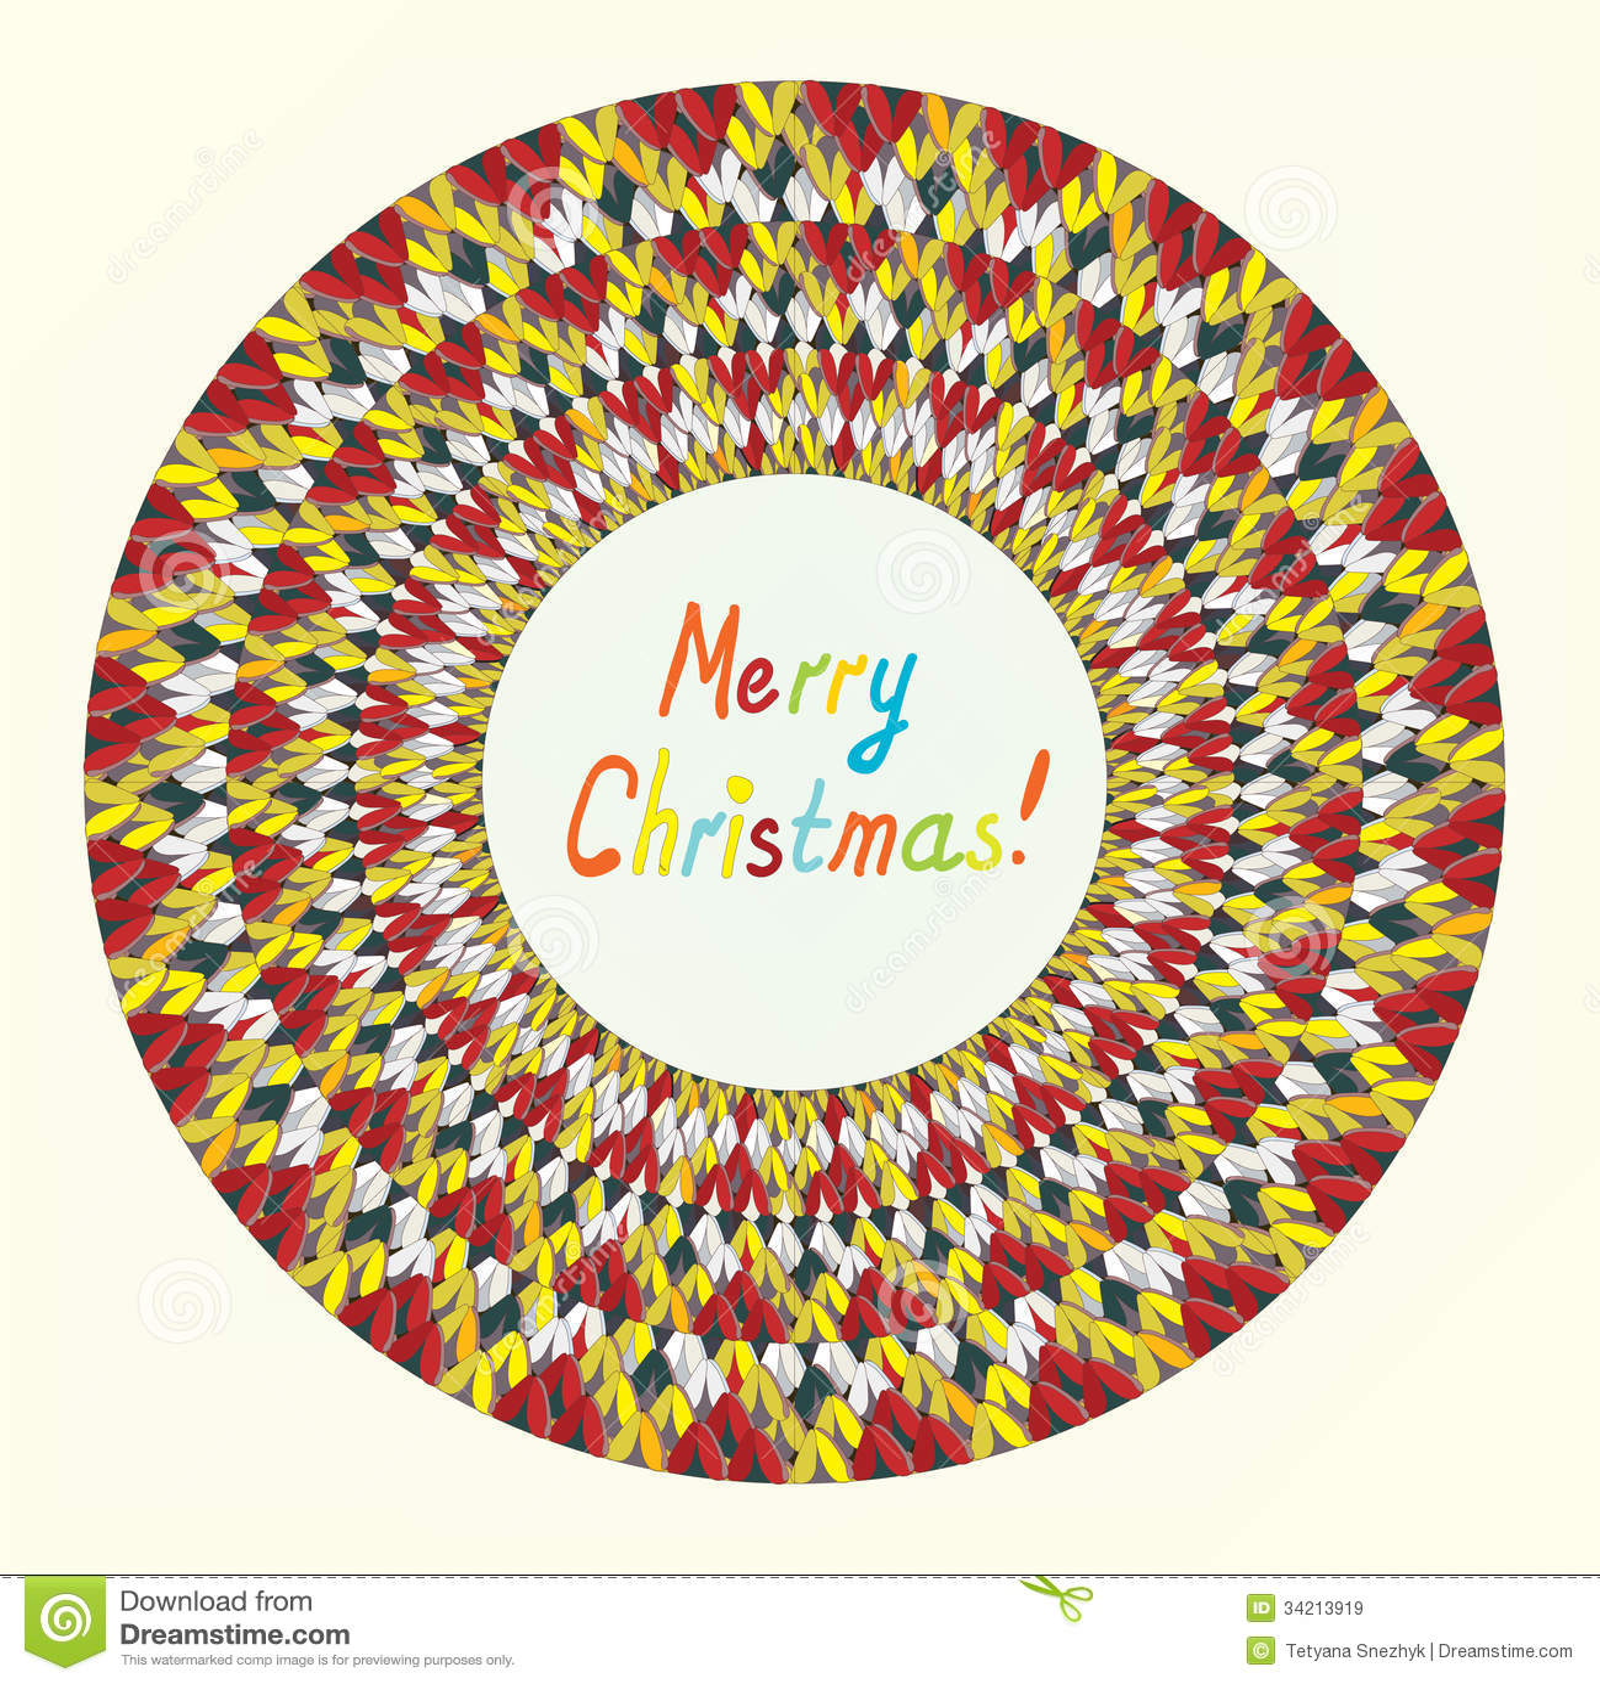 Knitting Happy Birthday Card : Merry christmas knitting greeting card stock vector